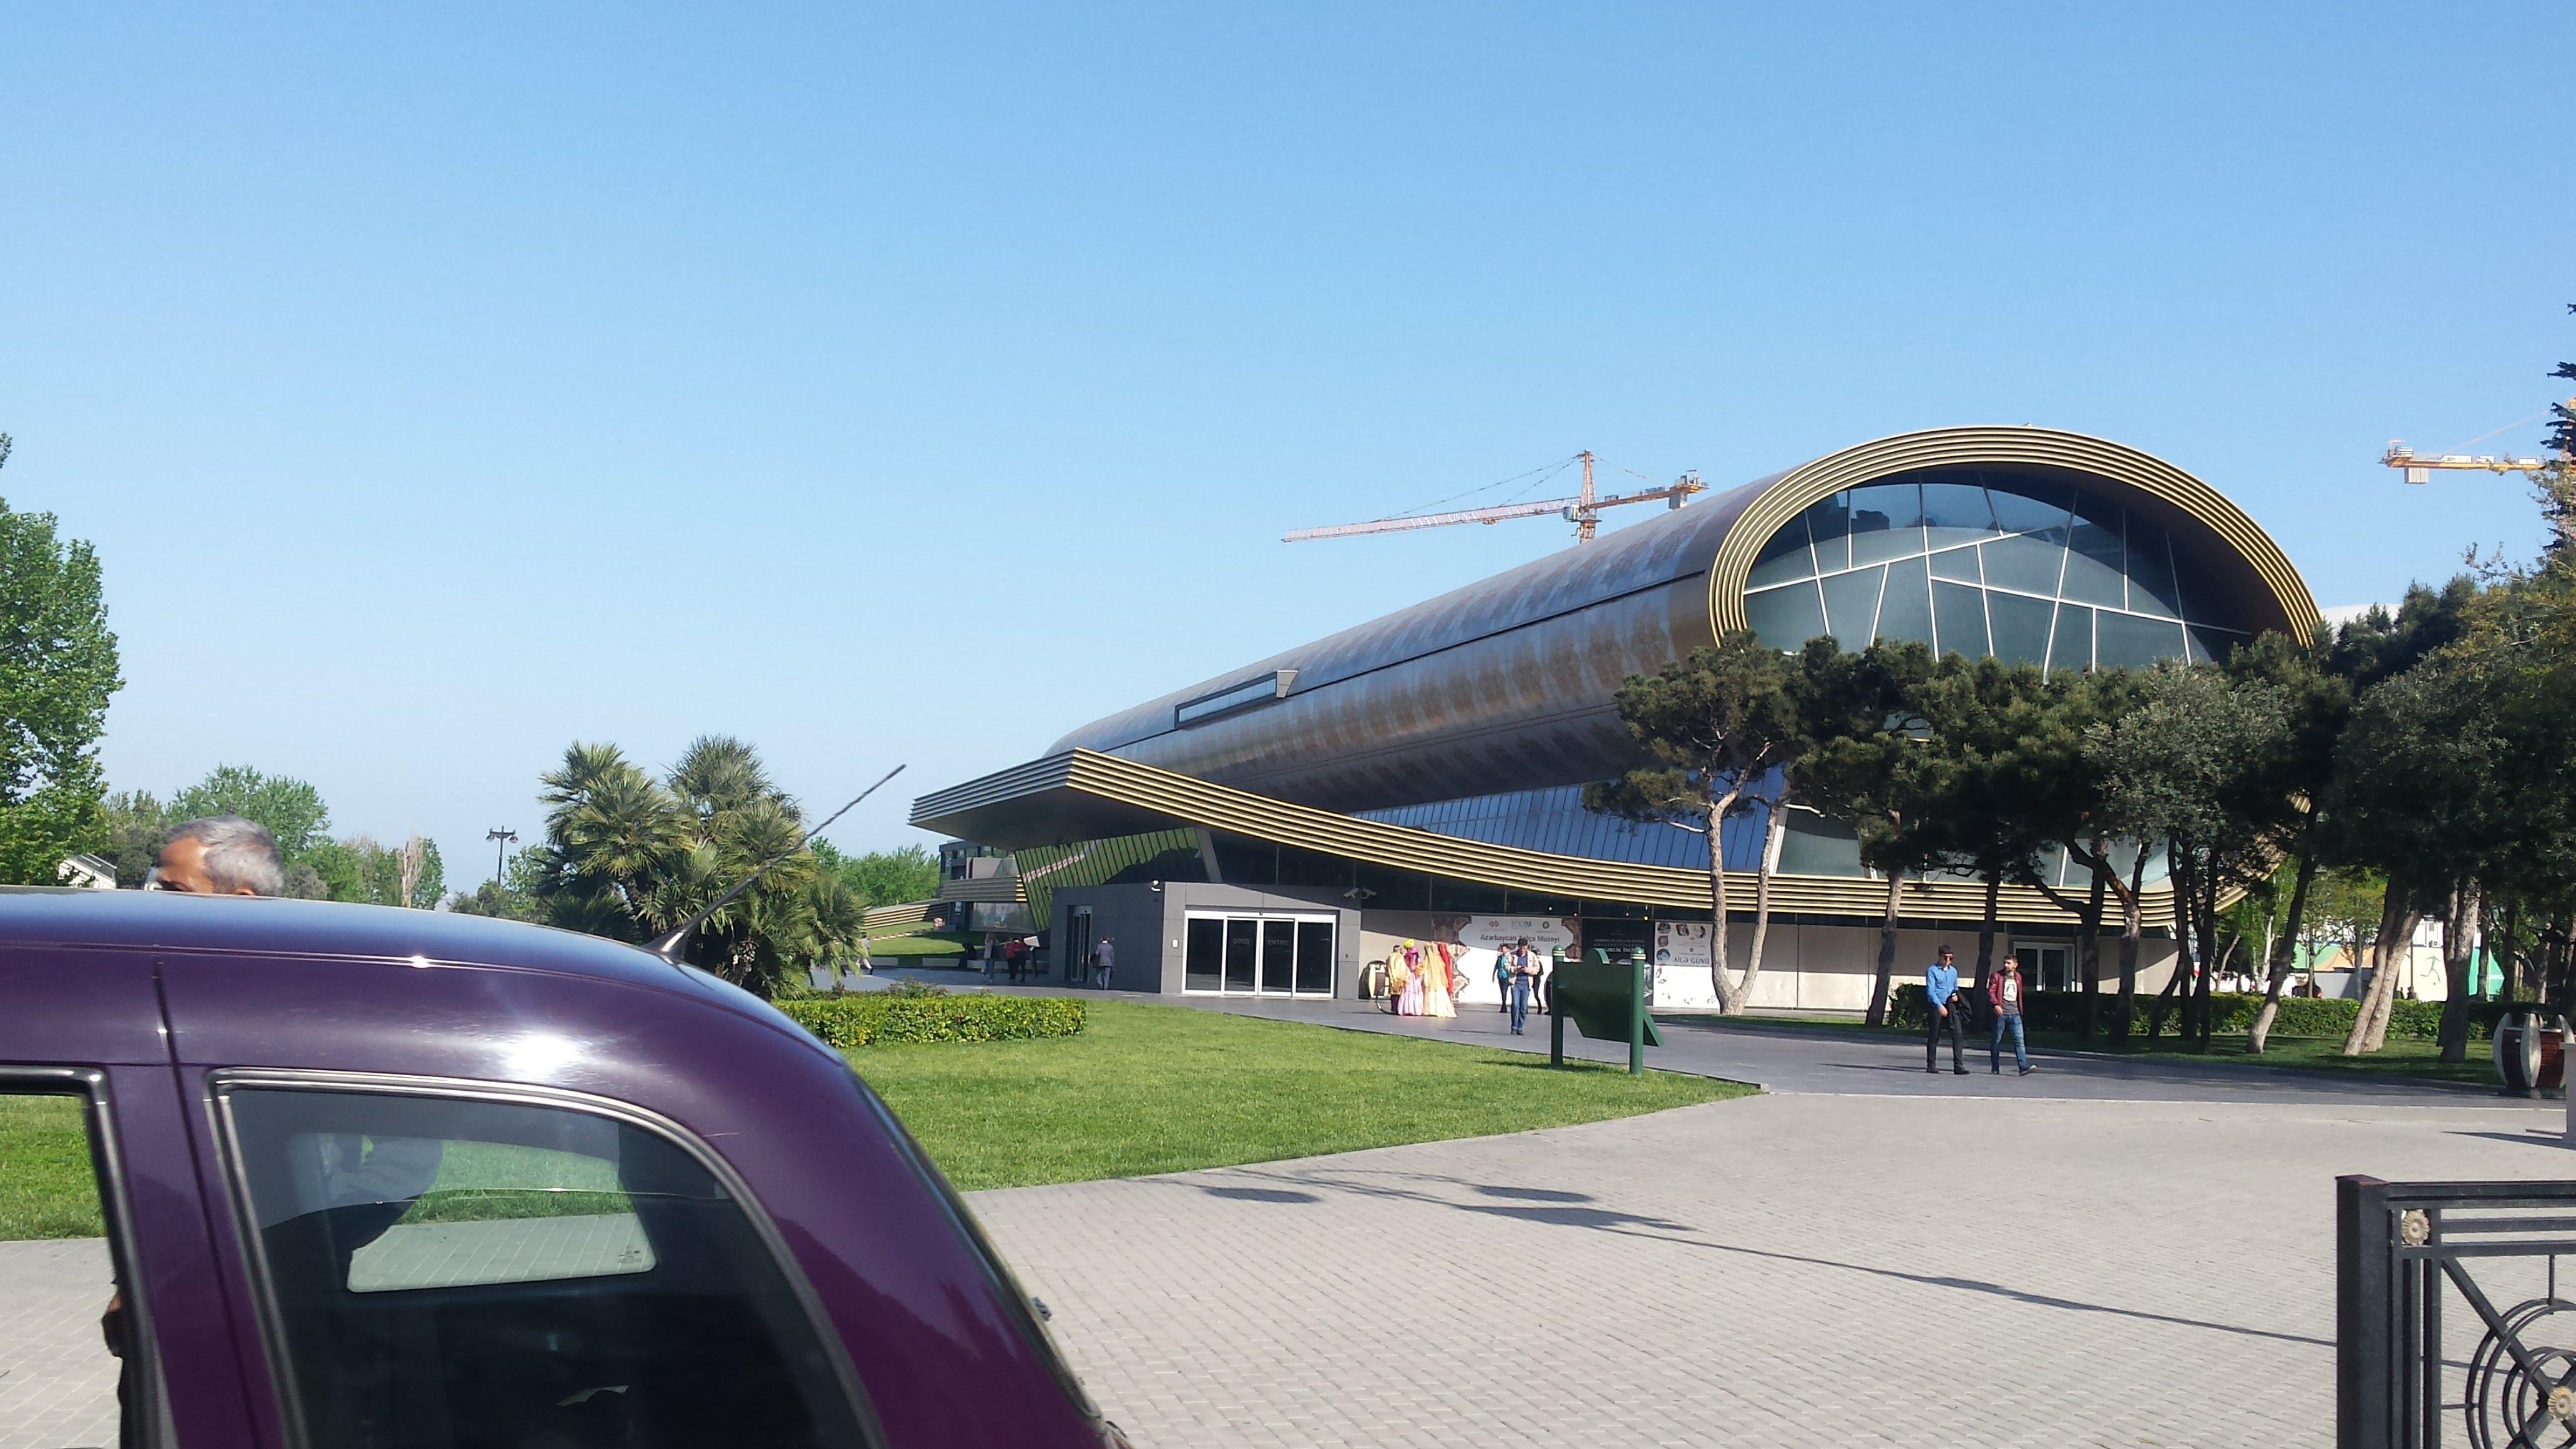 Impressies van Azerbeidzjan